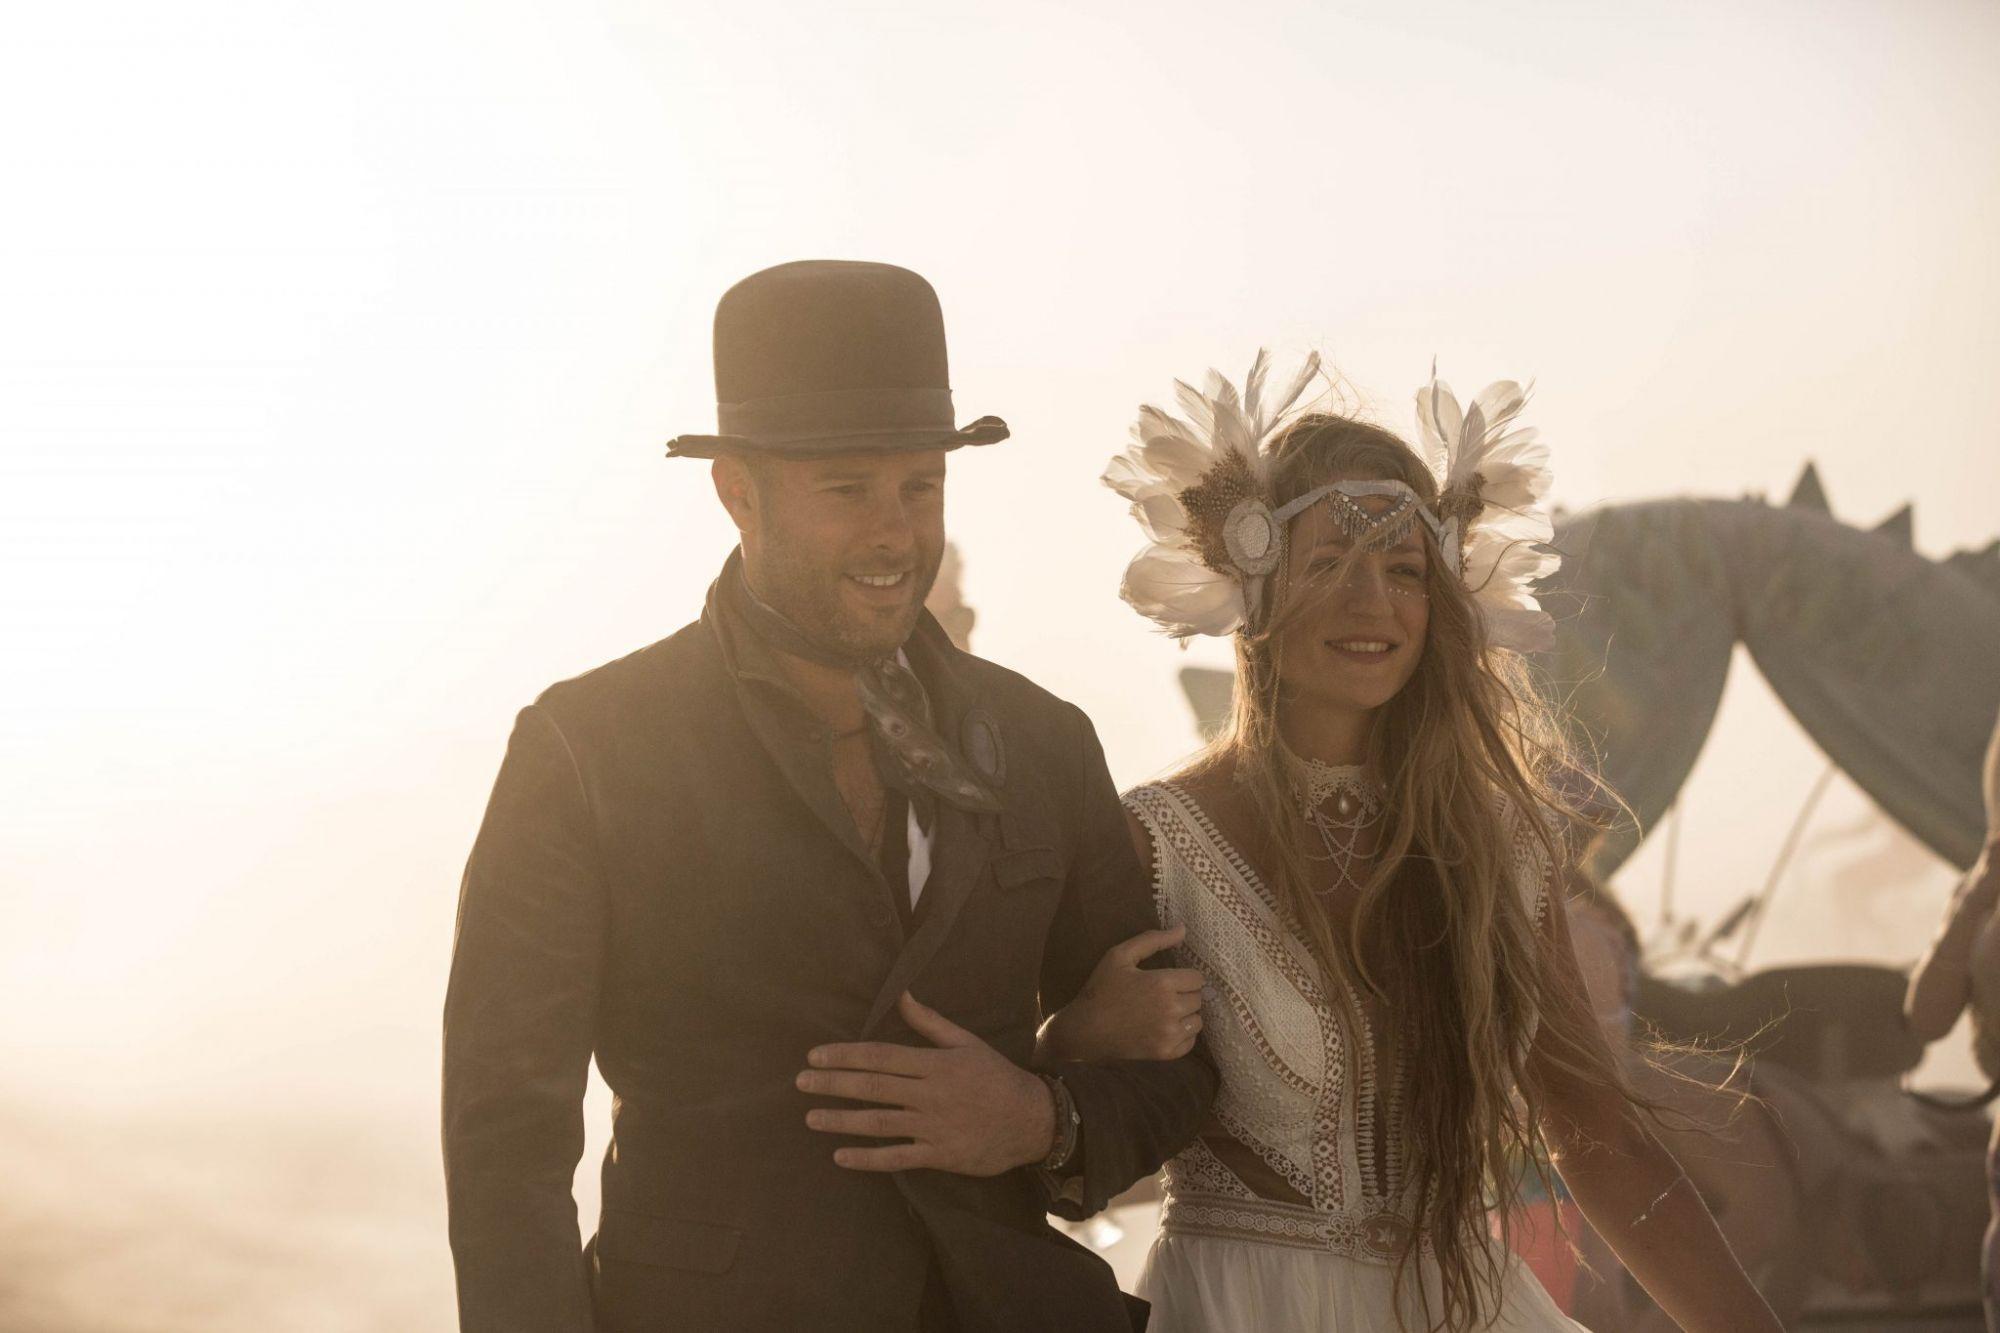 "Hand in hand at the desert storm. Burningman 2016 (צילום: תומר פרץ. שמלה מושלמת: ""עמנואל"", תכשיט ראש: רונית פורטל)"